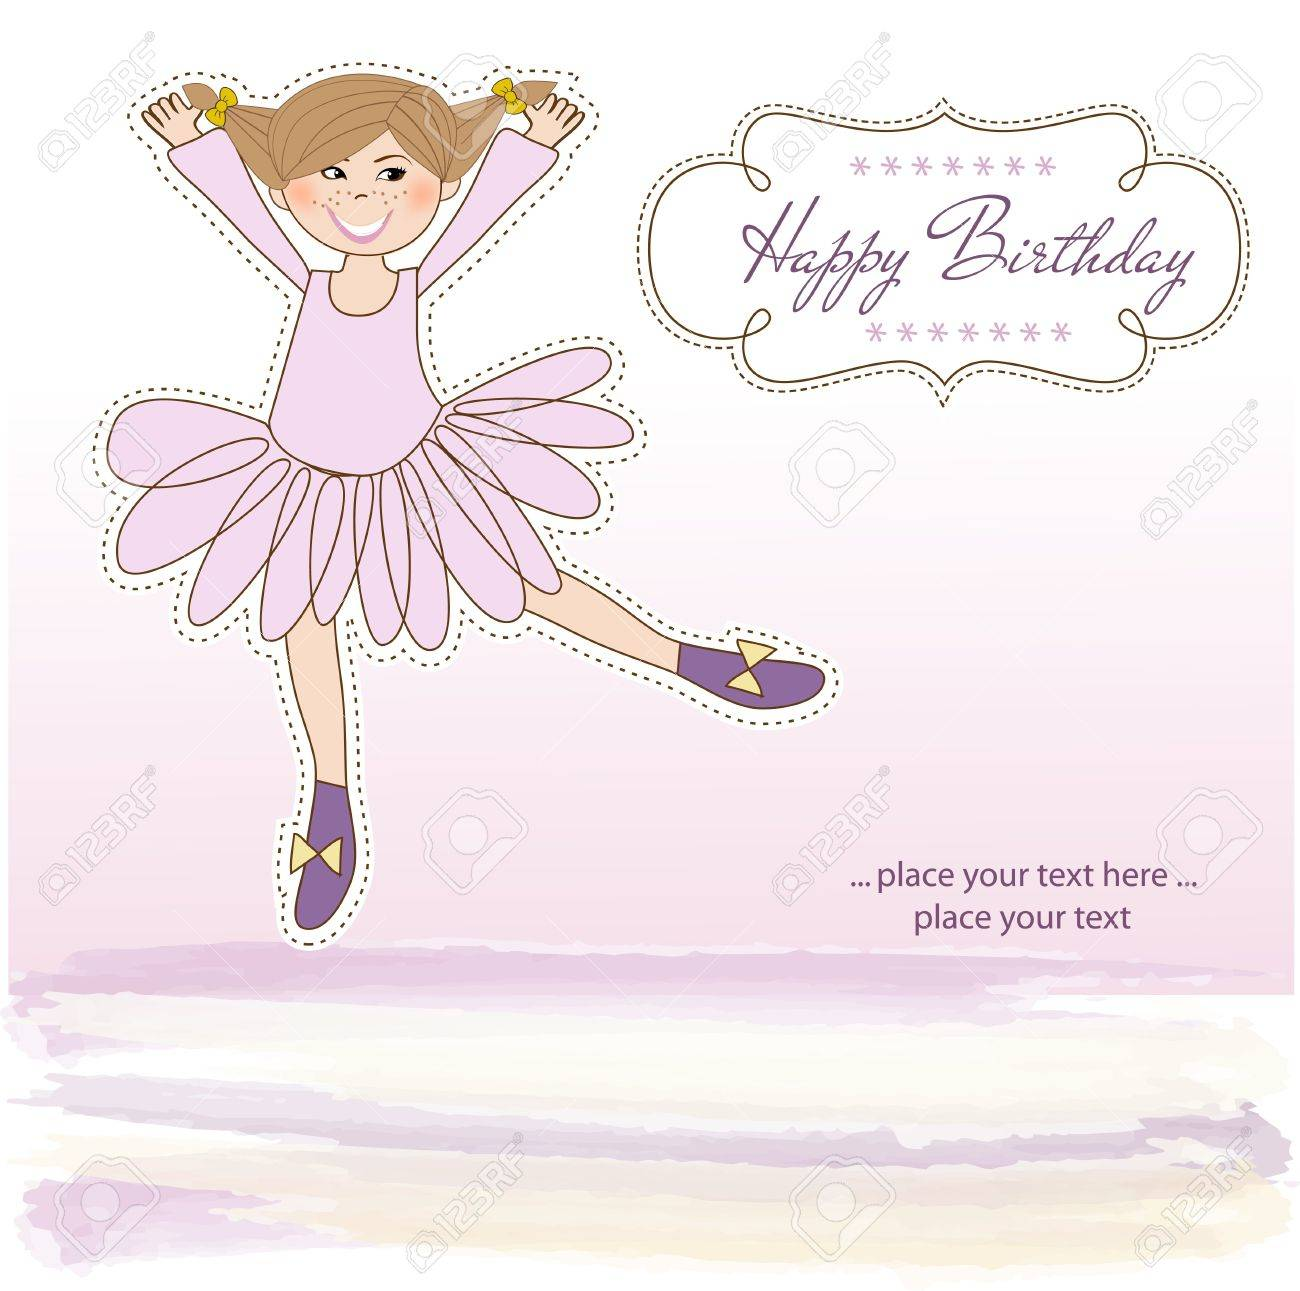 Sweet Girl Birthday Greeting Card Stock Vector - 11022581